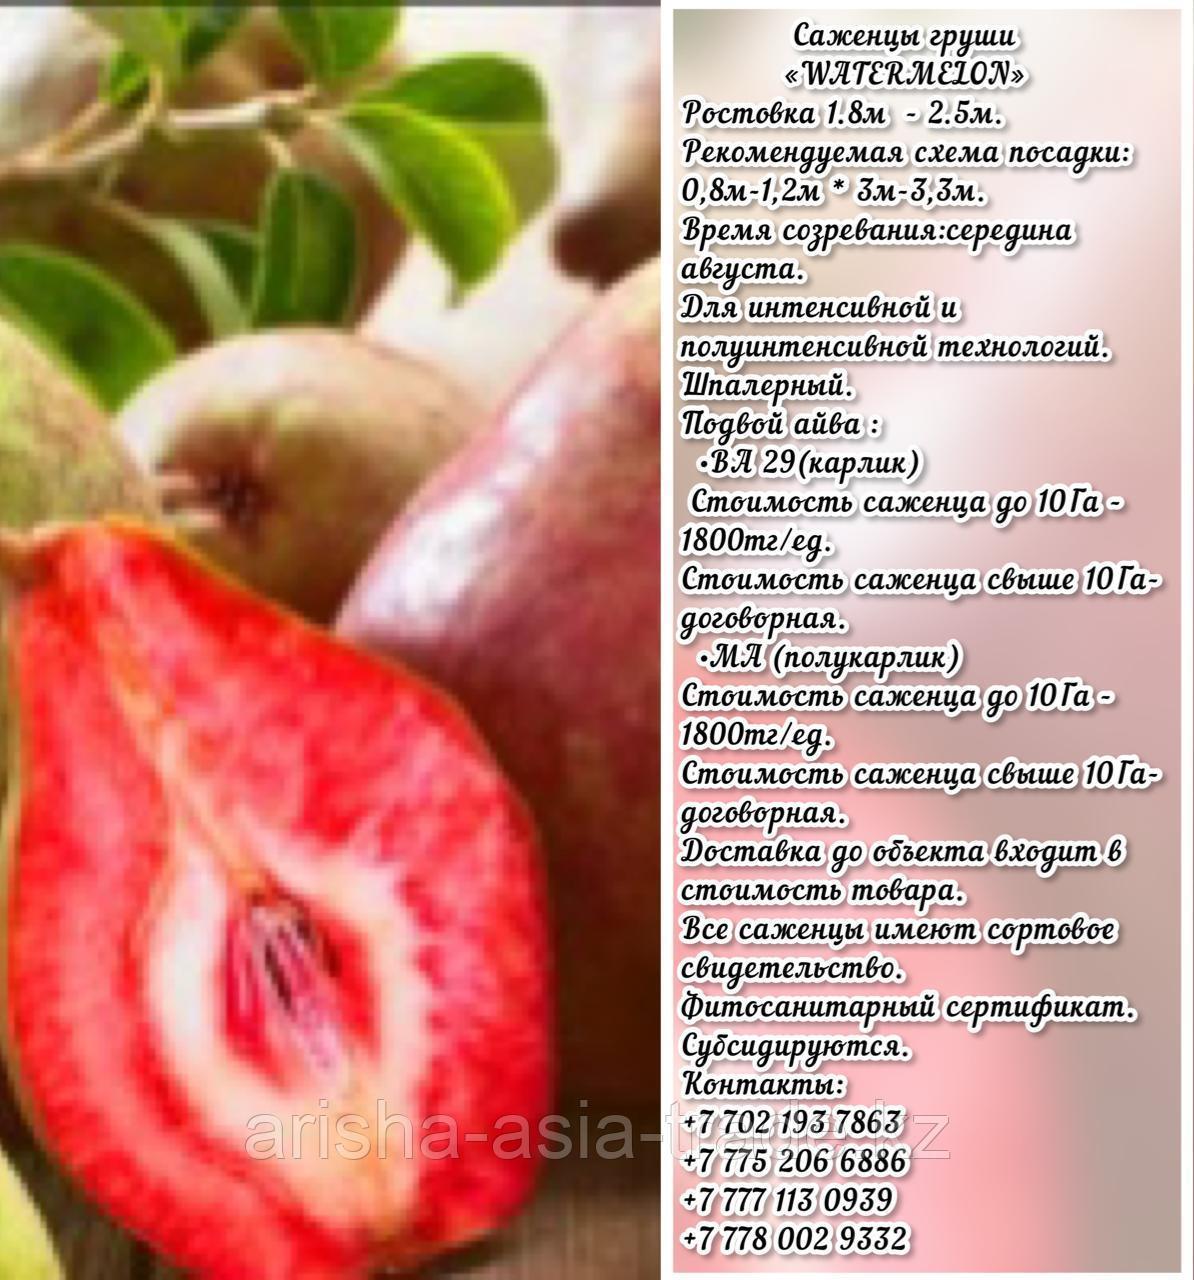 Саженец груши Watermelon (Вотермелон) Сербия